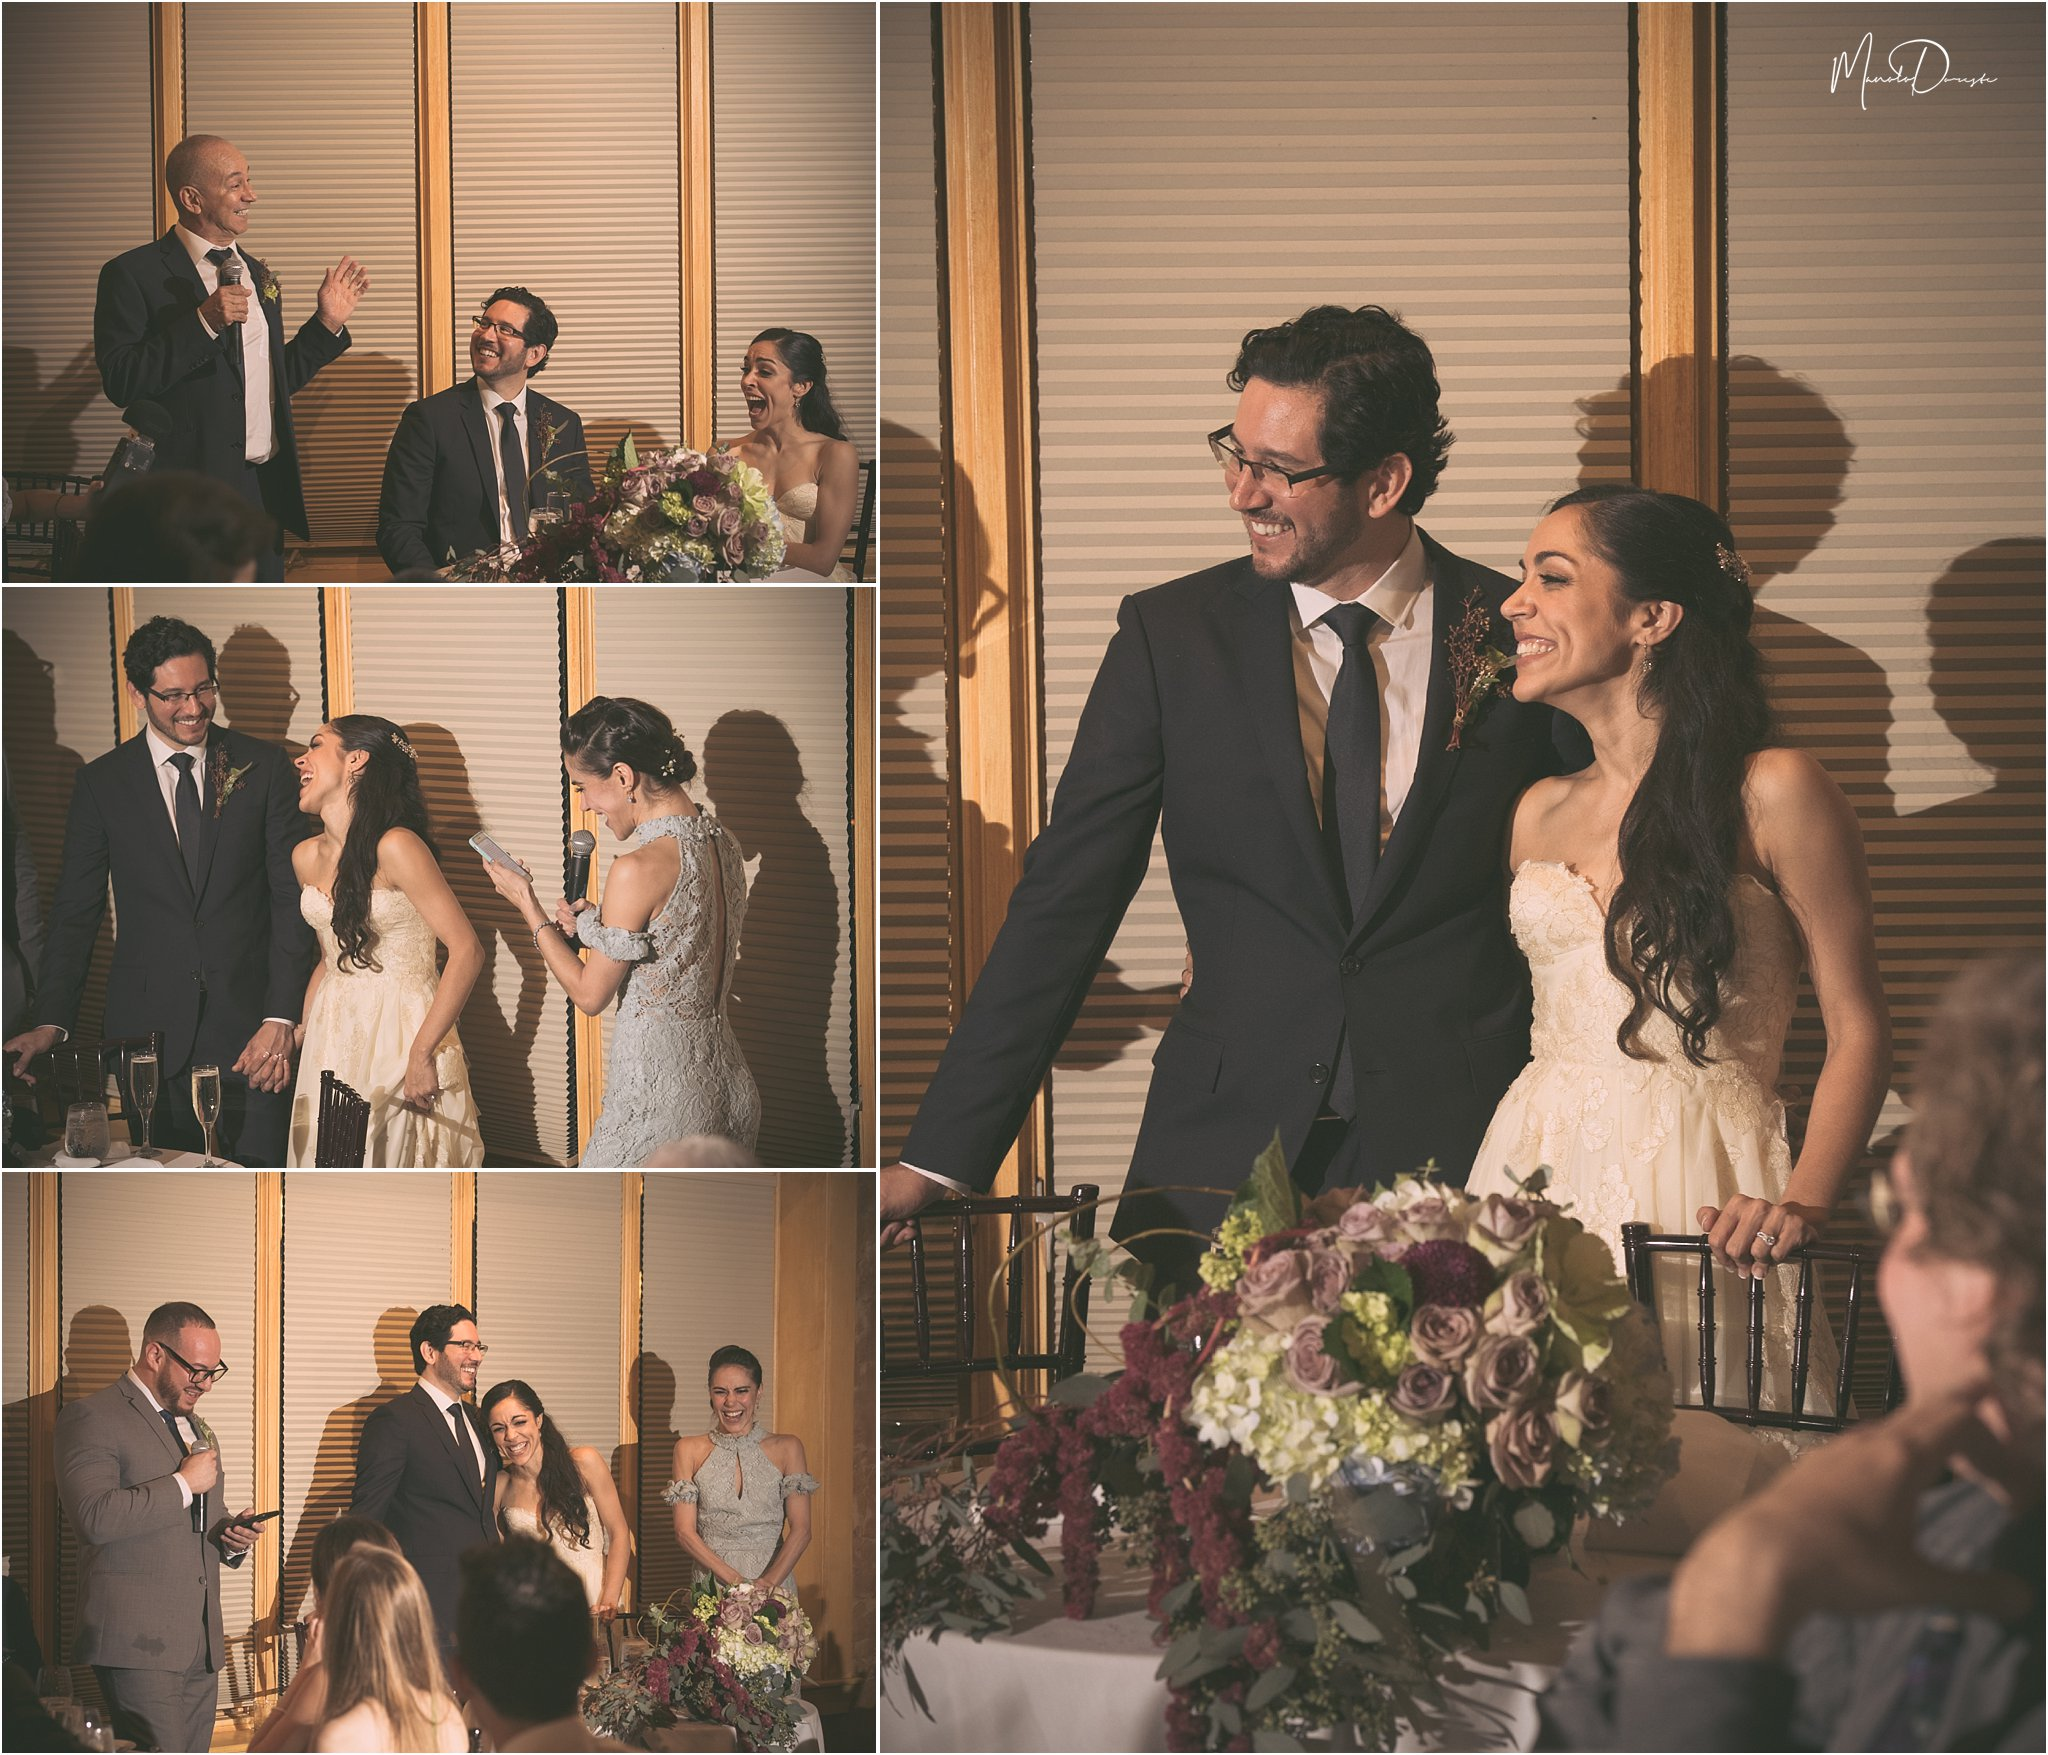 0523_ManoloDoreste_InFocusStudios_Wedding_Family_Photography_Miami_MiamiPhotographer.jpg